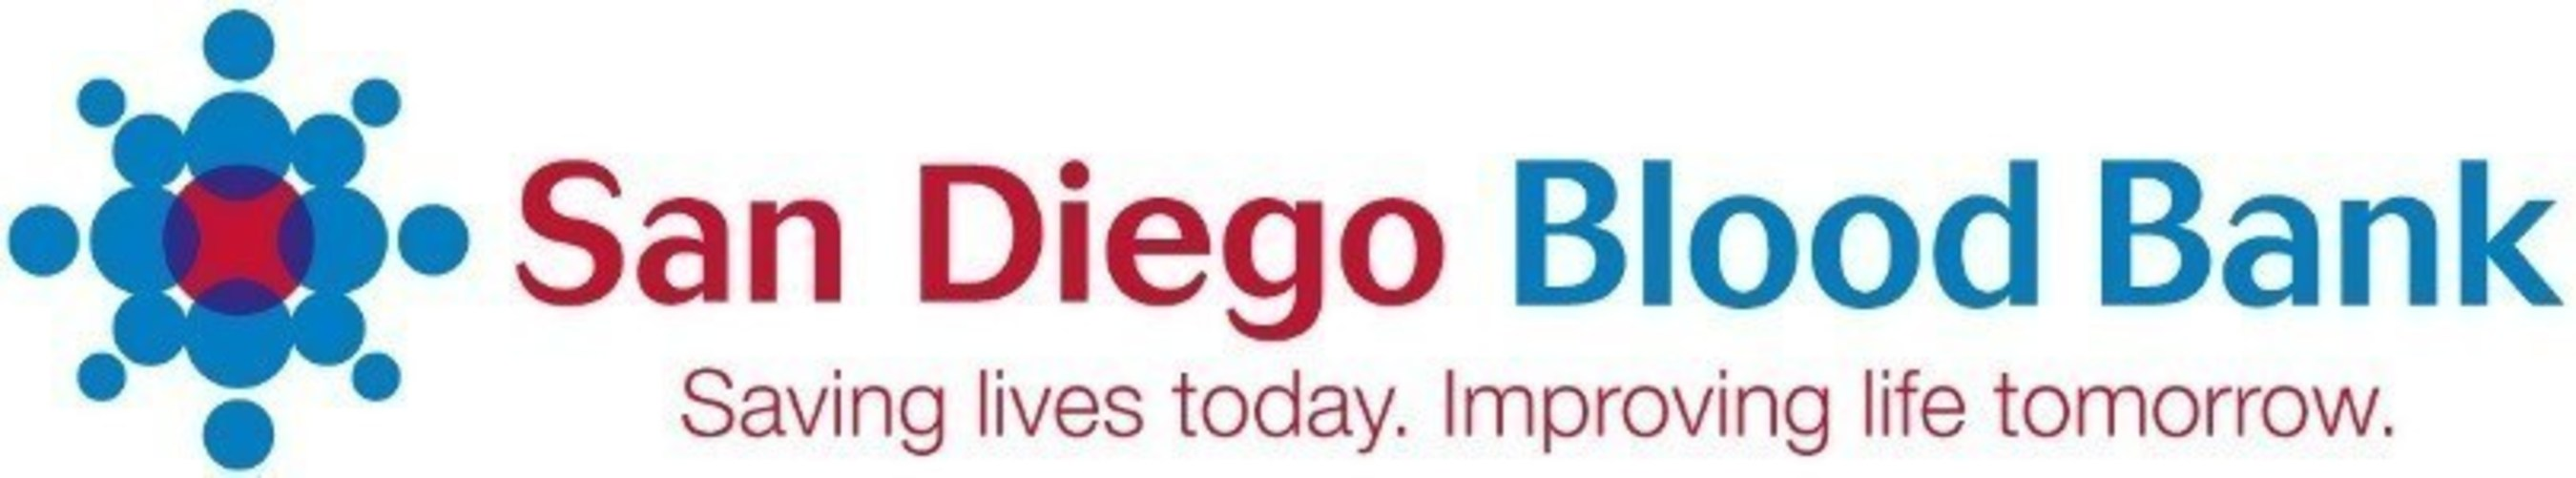 San Diego Blood Bank Logo